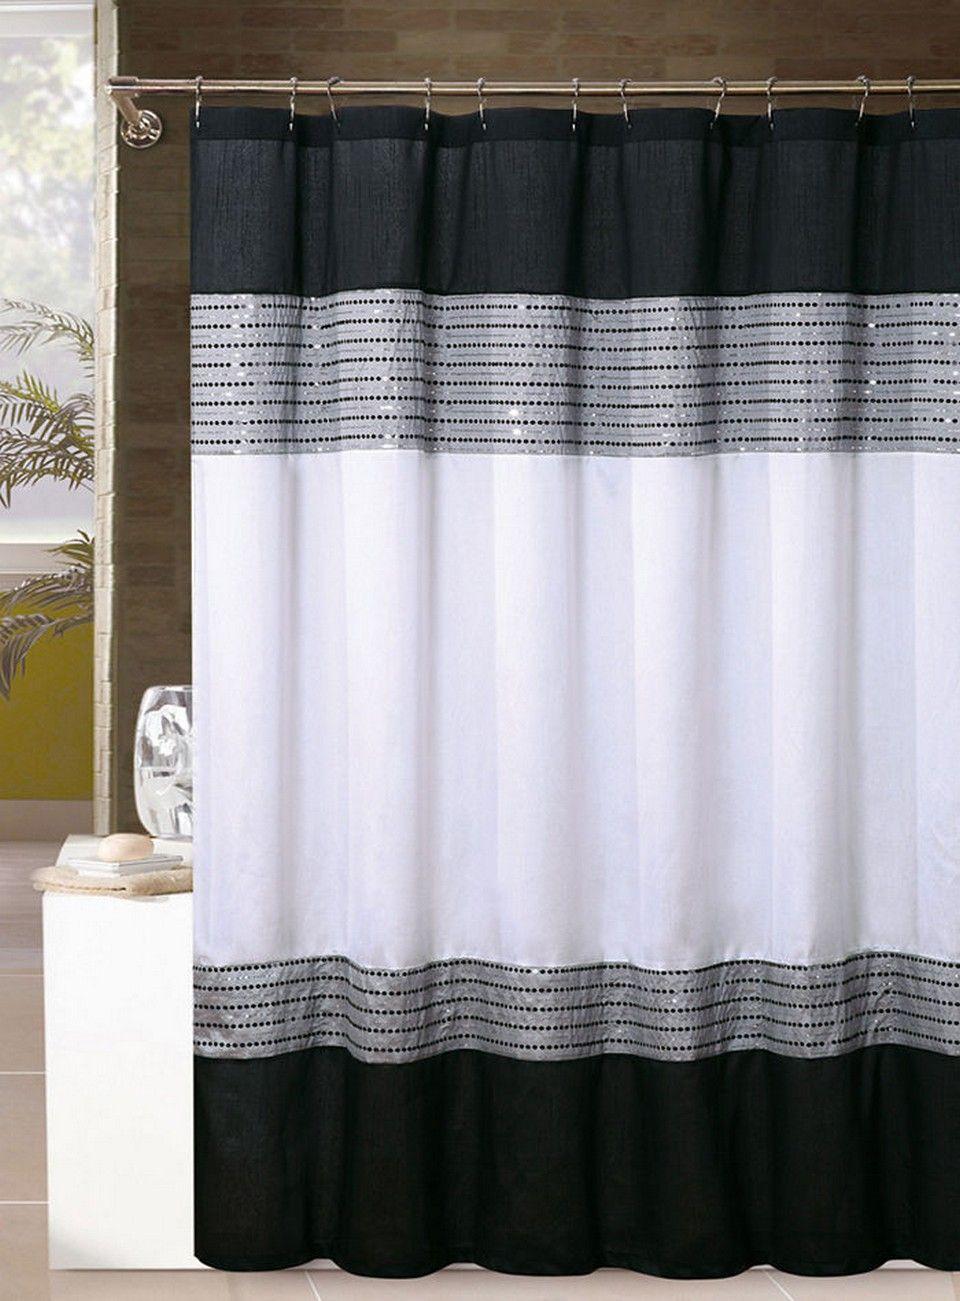 120 Unique And Modern Bathroom Shower Curtain Ideas Black